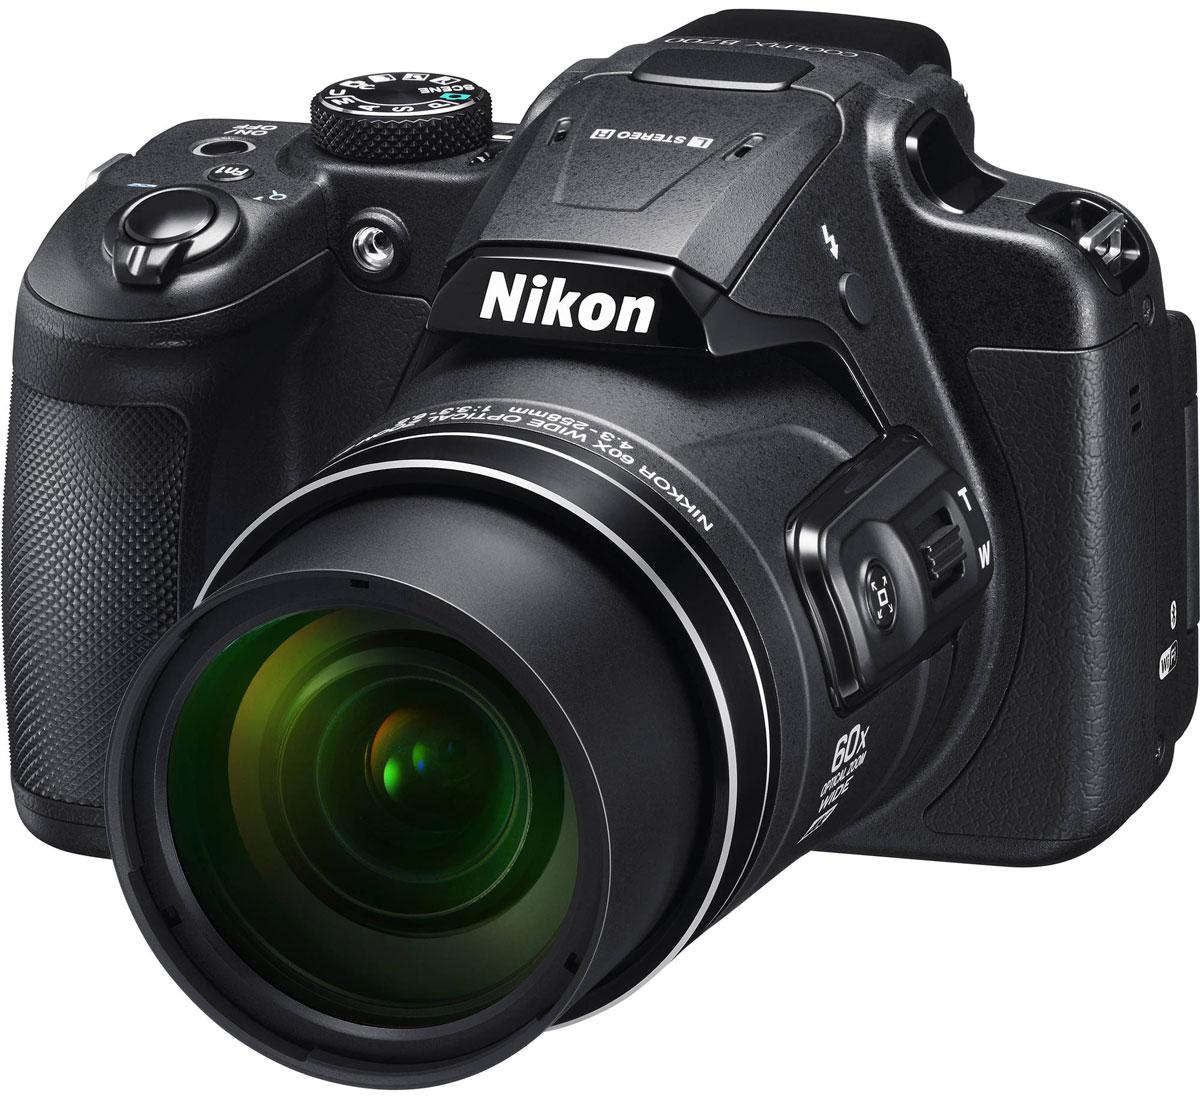 Nikon Coolpix B700, Black цифровая фотокамера - Цифровые фотоаппараты